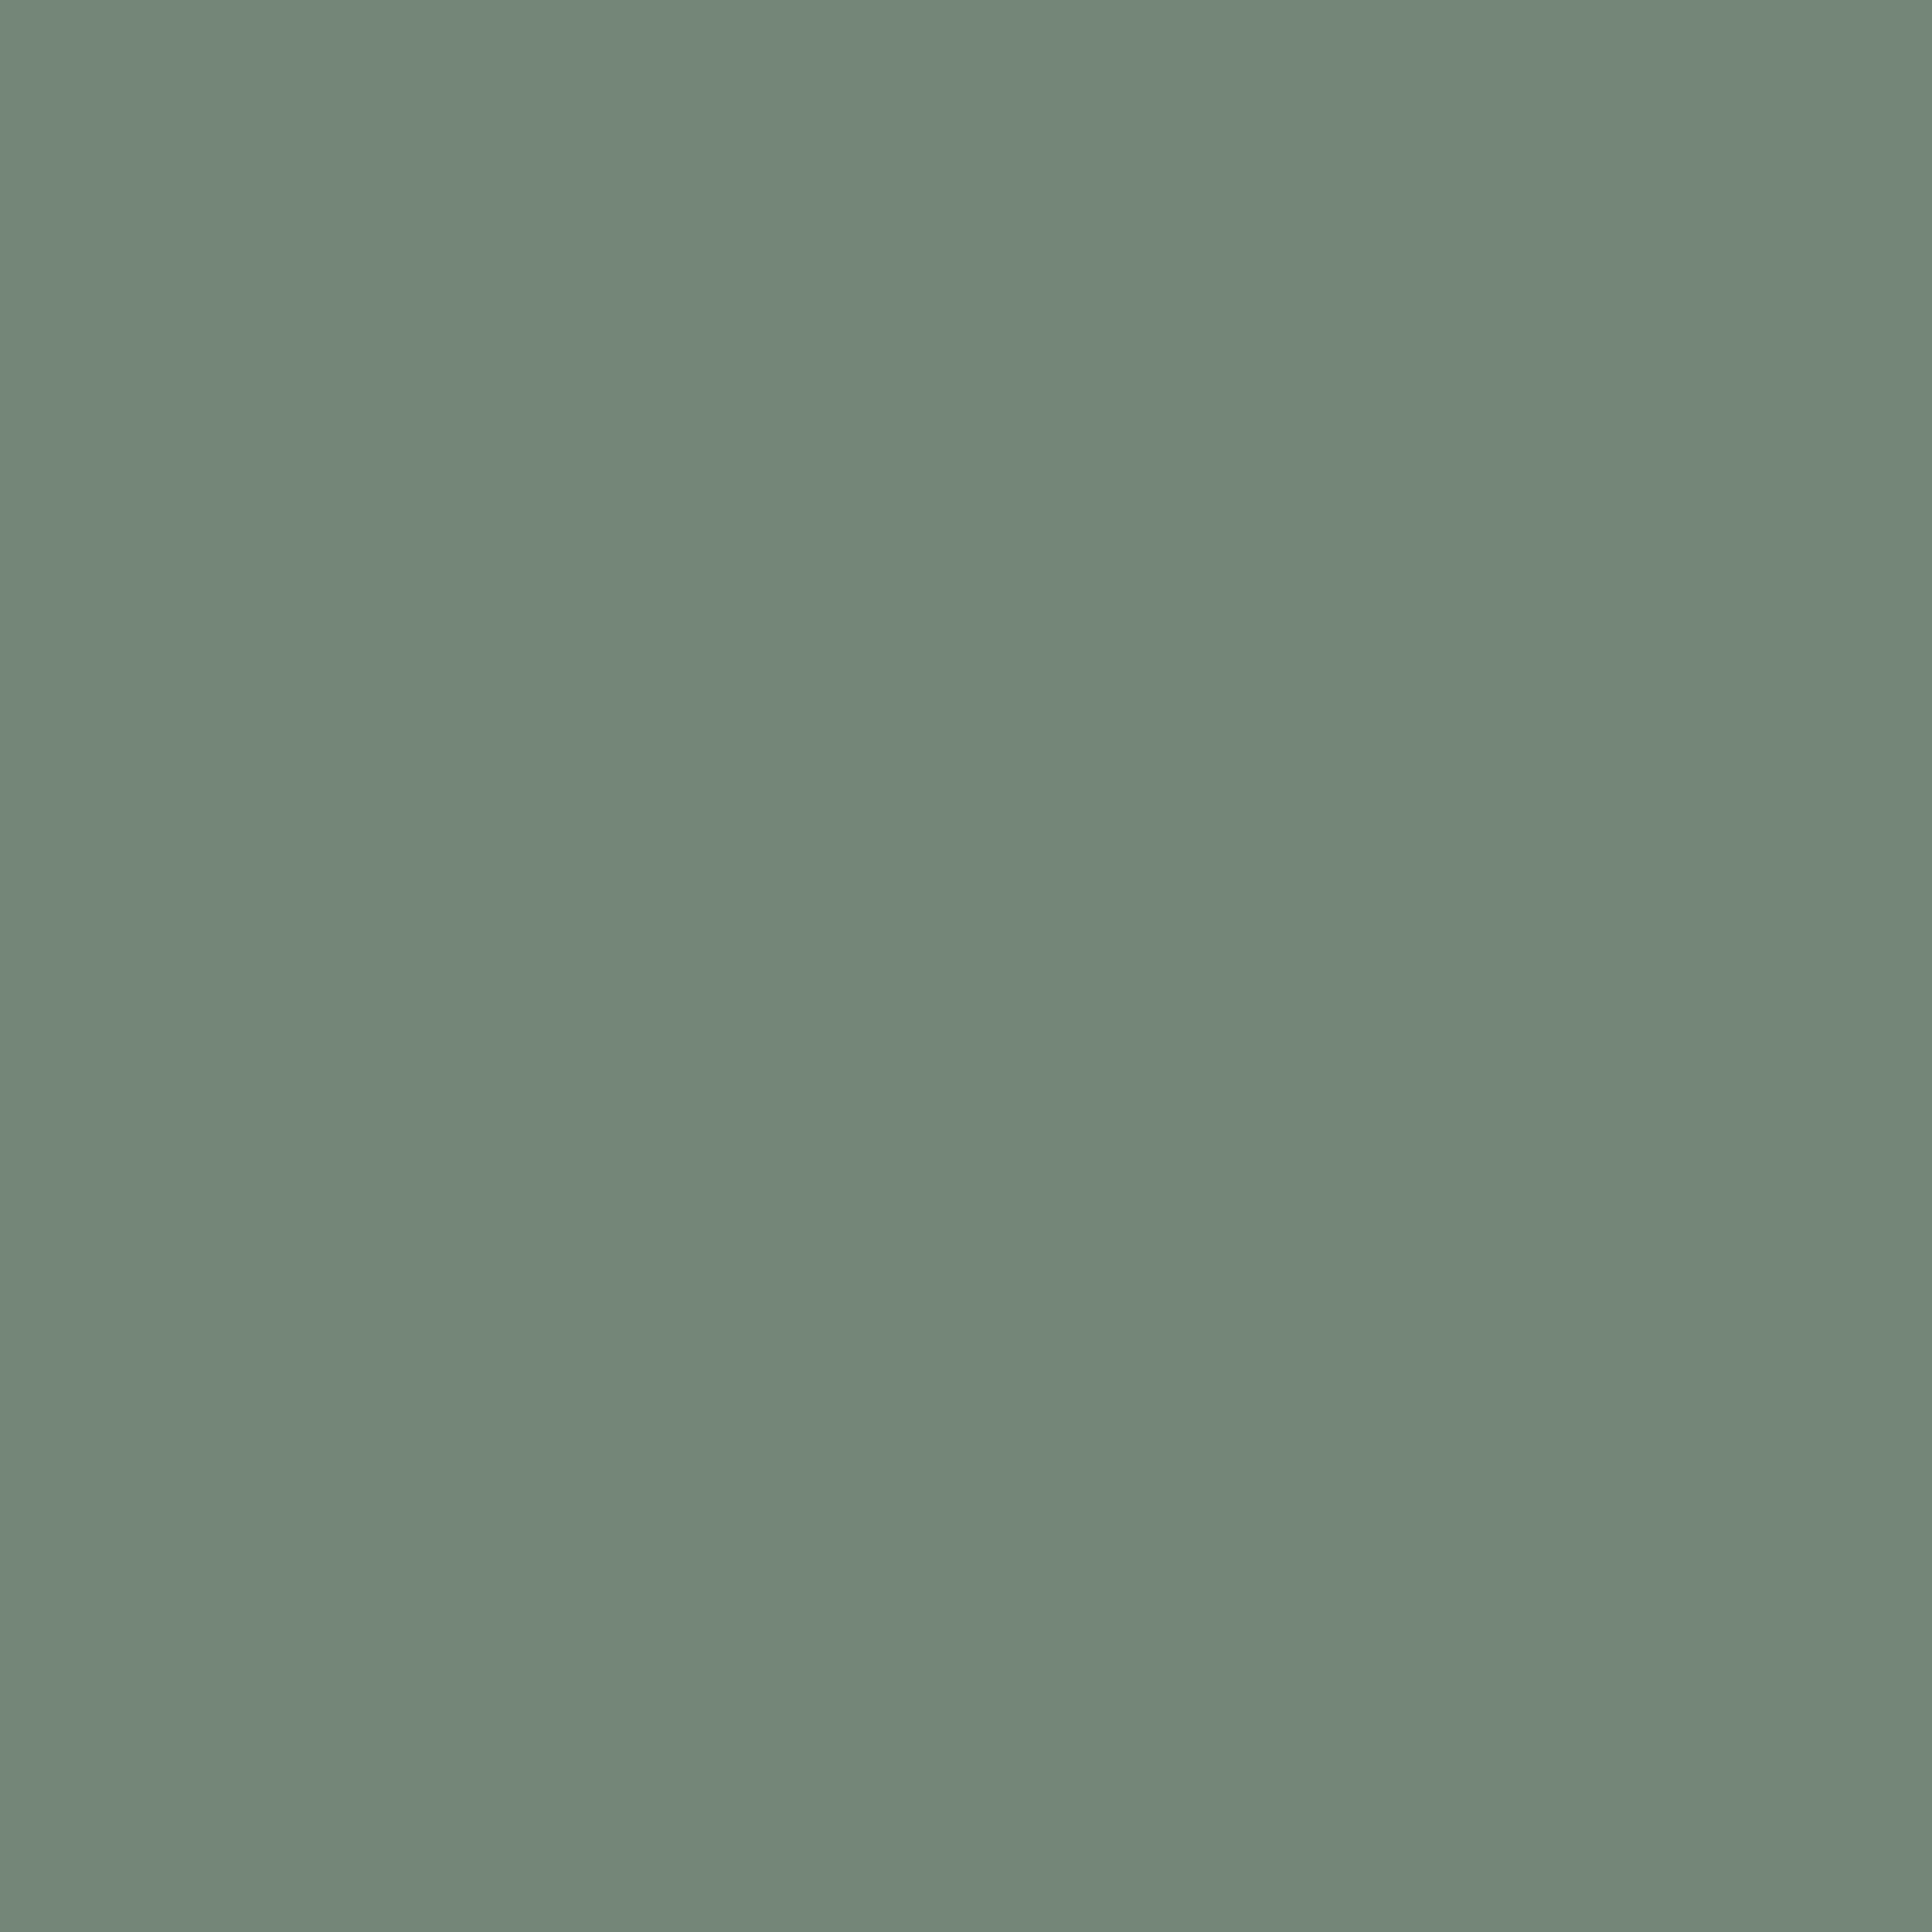 2048x2048 Xanadu Solid Color Background